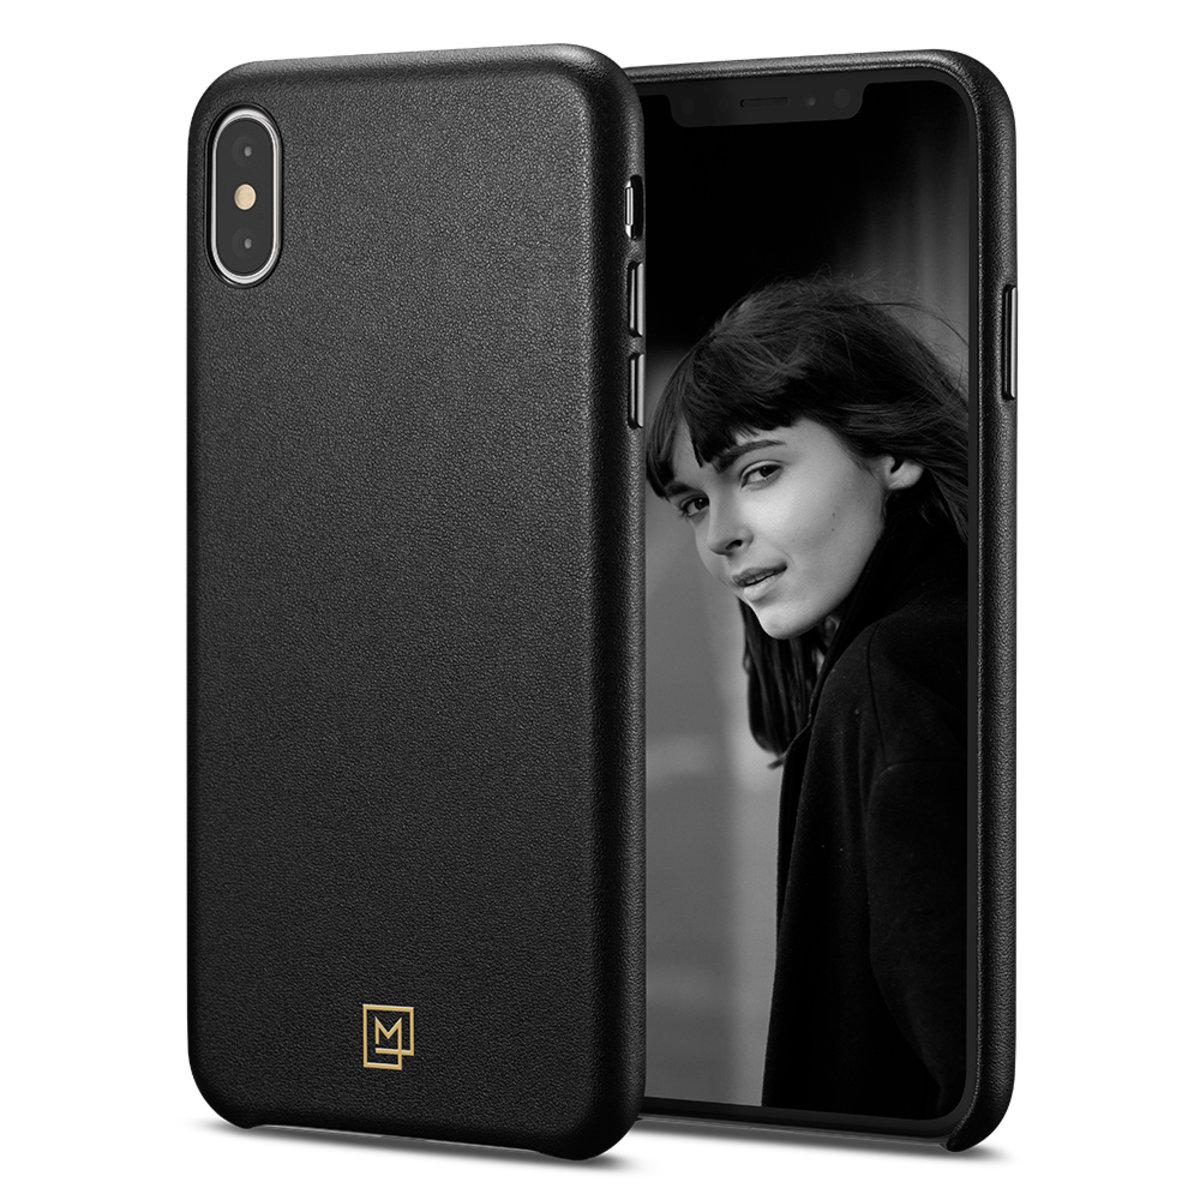 iPhone XS Max Case La Manon câlin - Chic Black